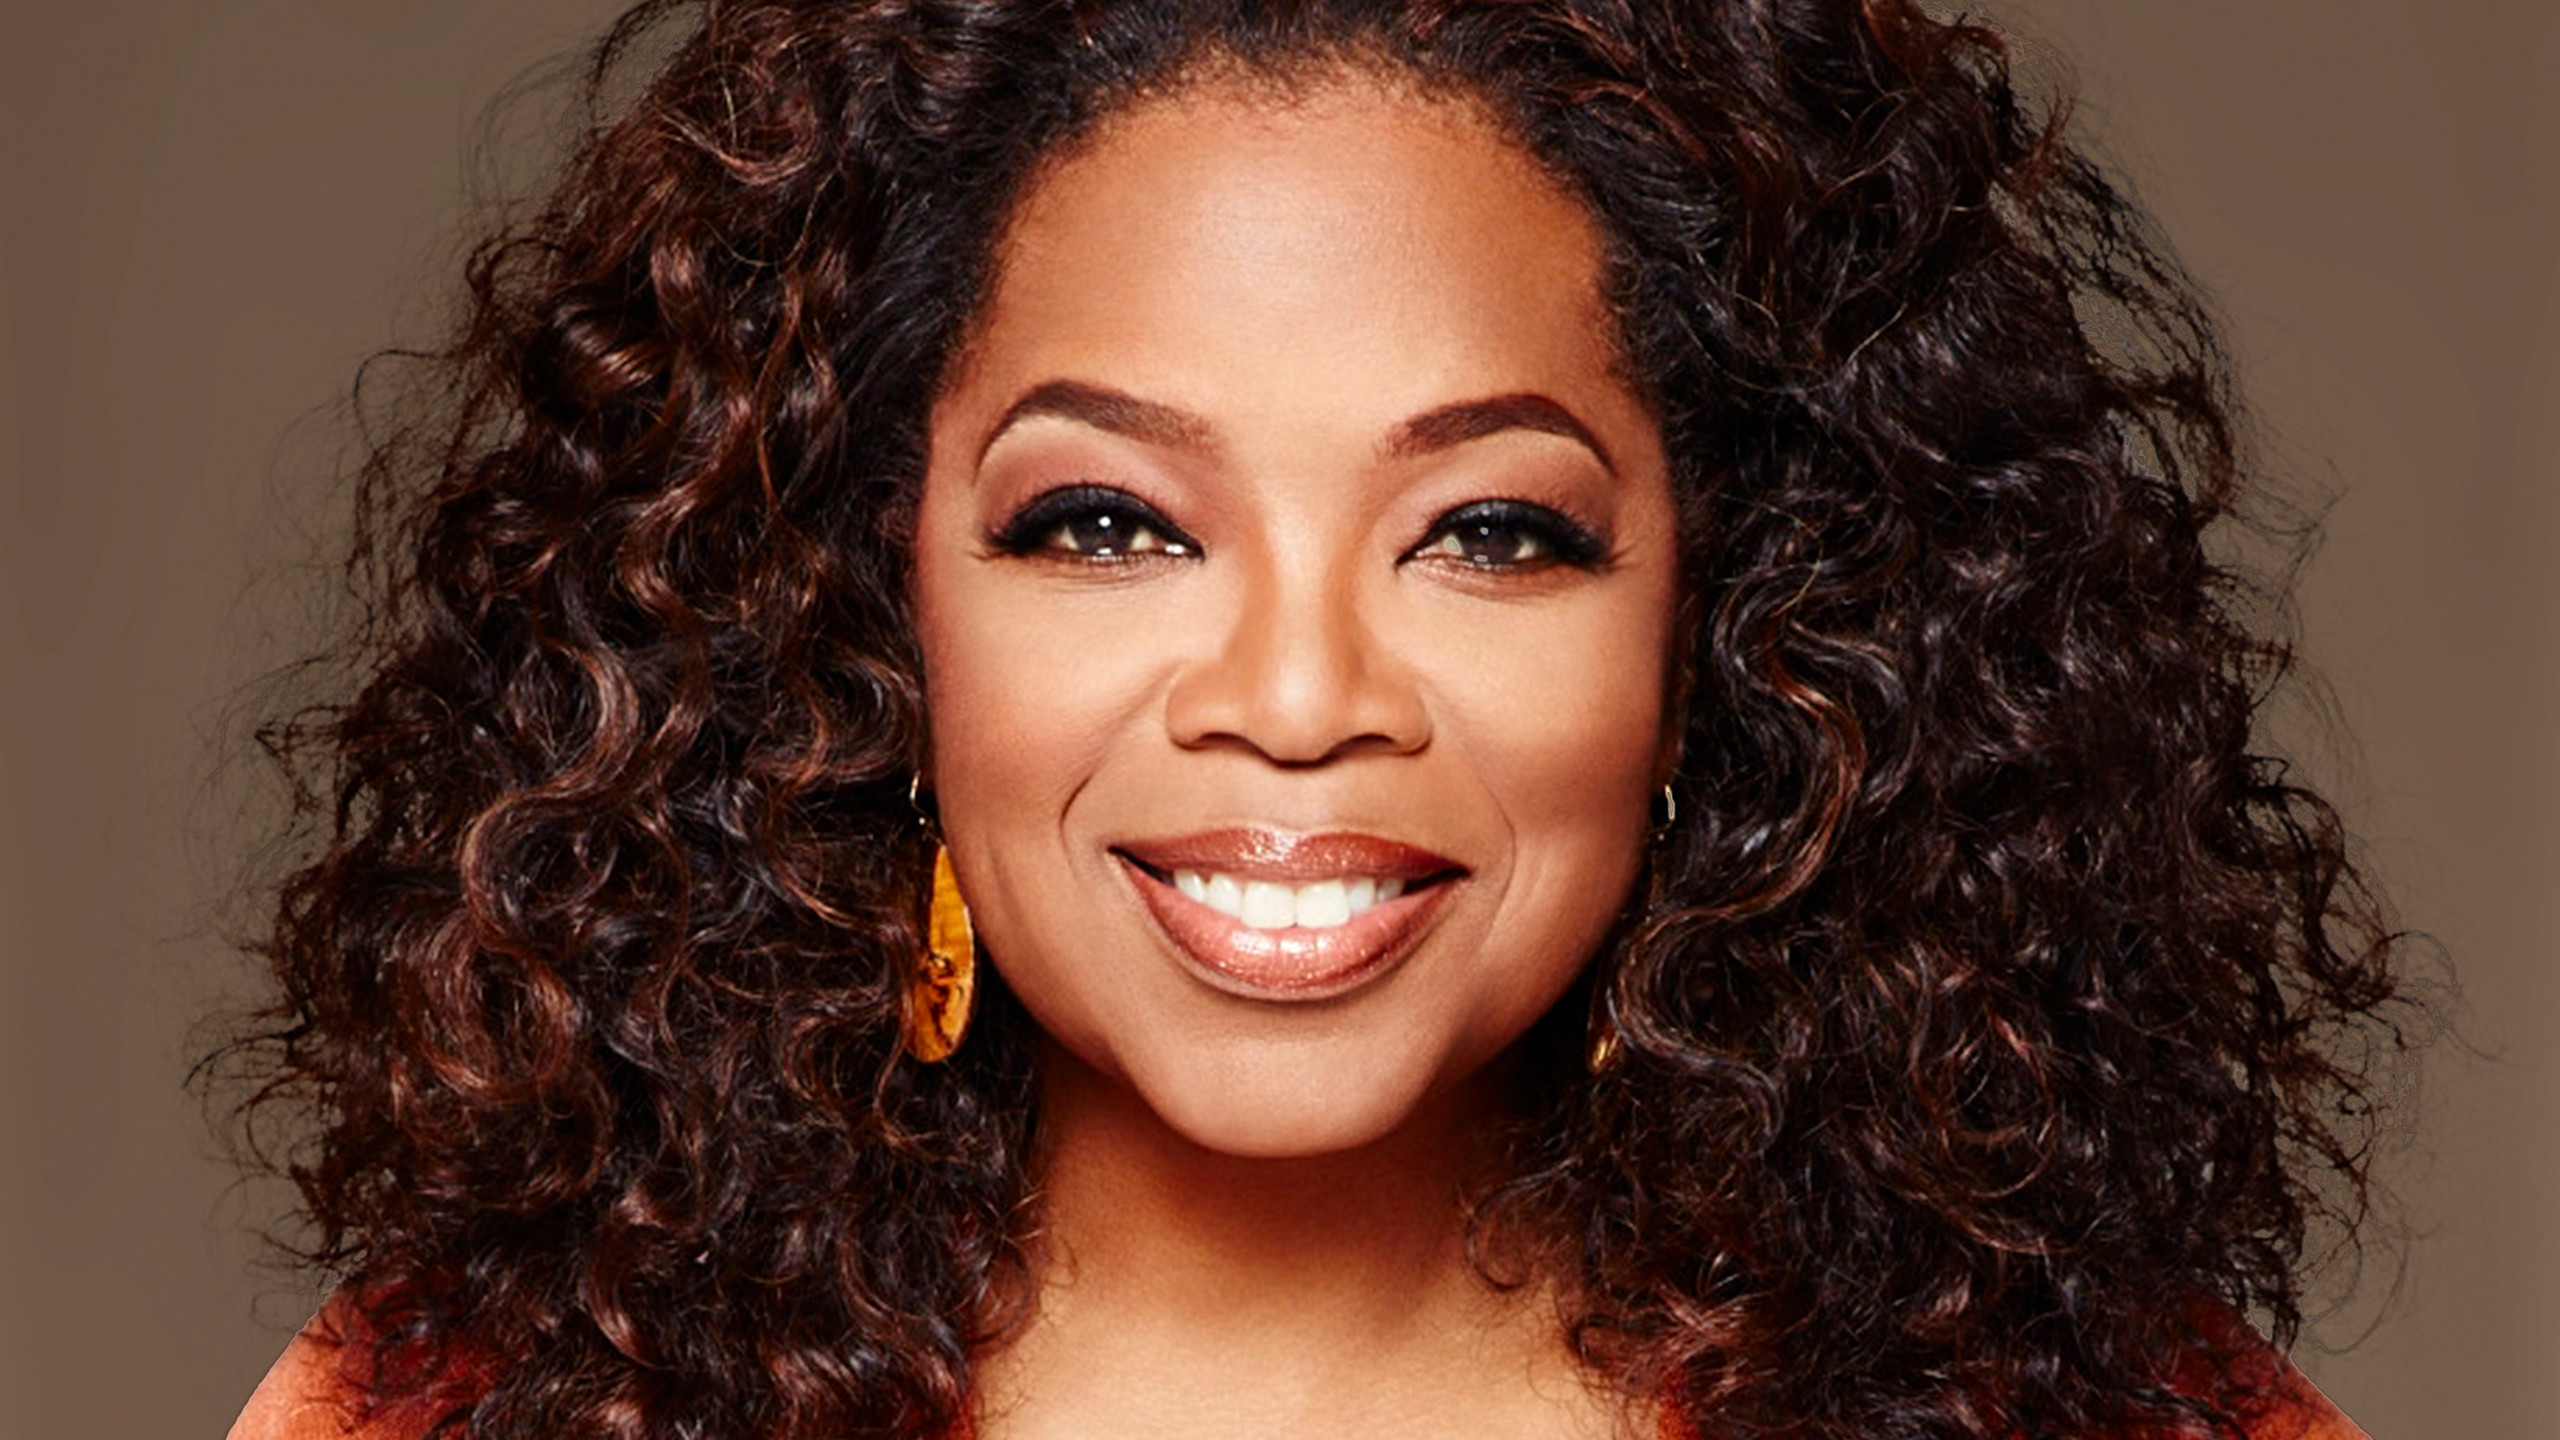 How Bio Identical Hormones Helped Oprah's Menopause